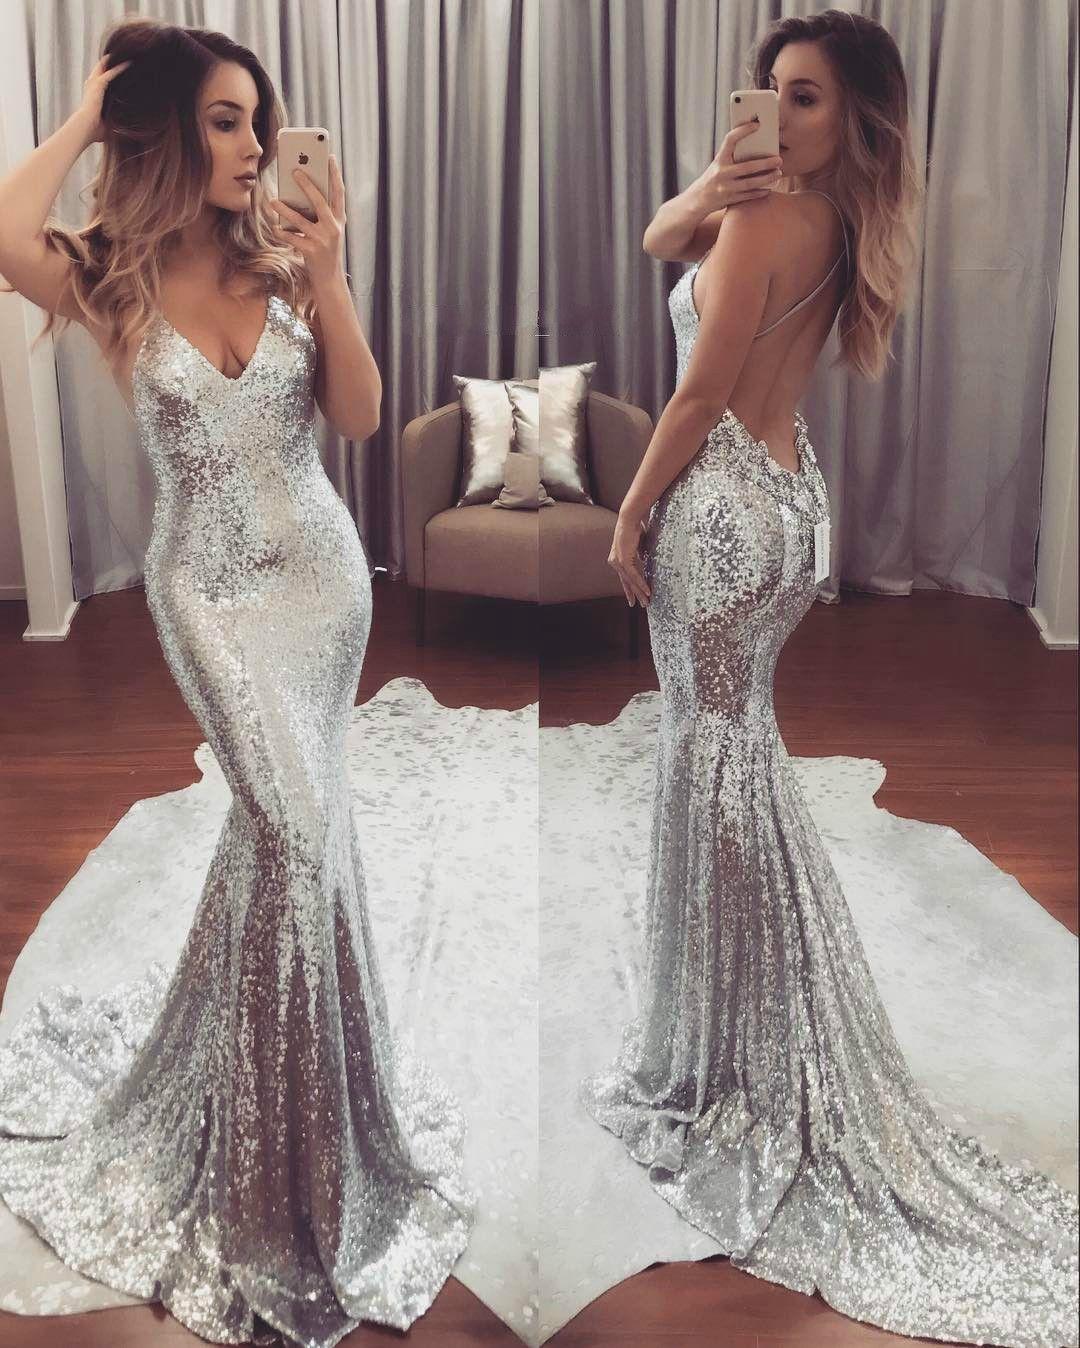 Bling Sequined Mermaid Prom Dress 세련된 V 넥 스파게티 스트랩 Sexy Backless Evening Dresses 파티 가운 Fishtail Beach 들러리 들러리 휴가